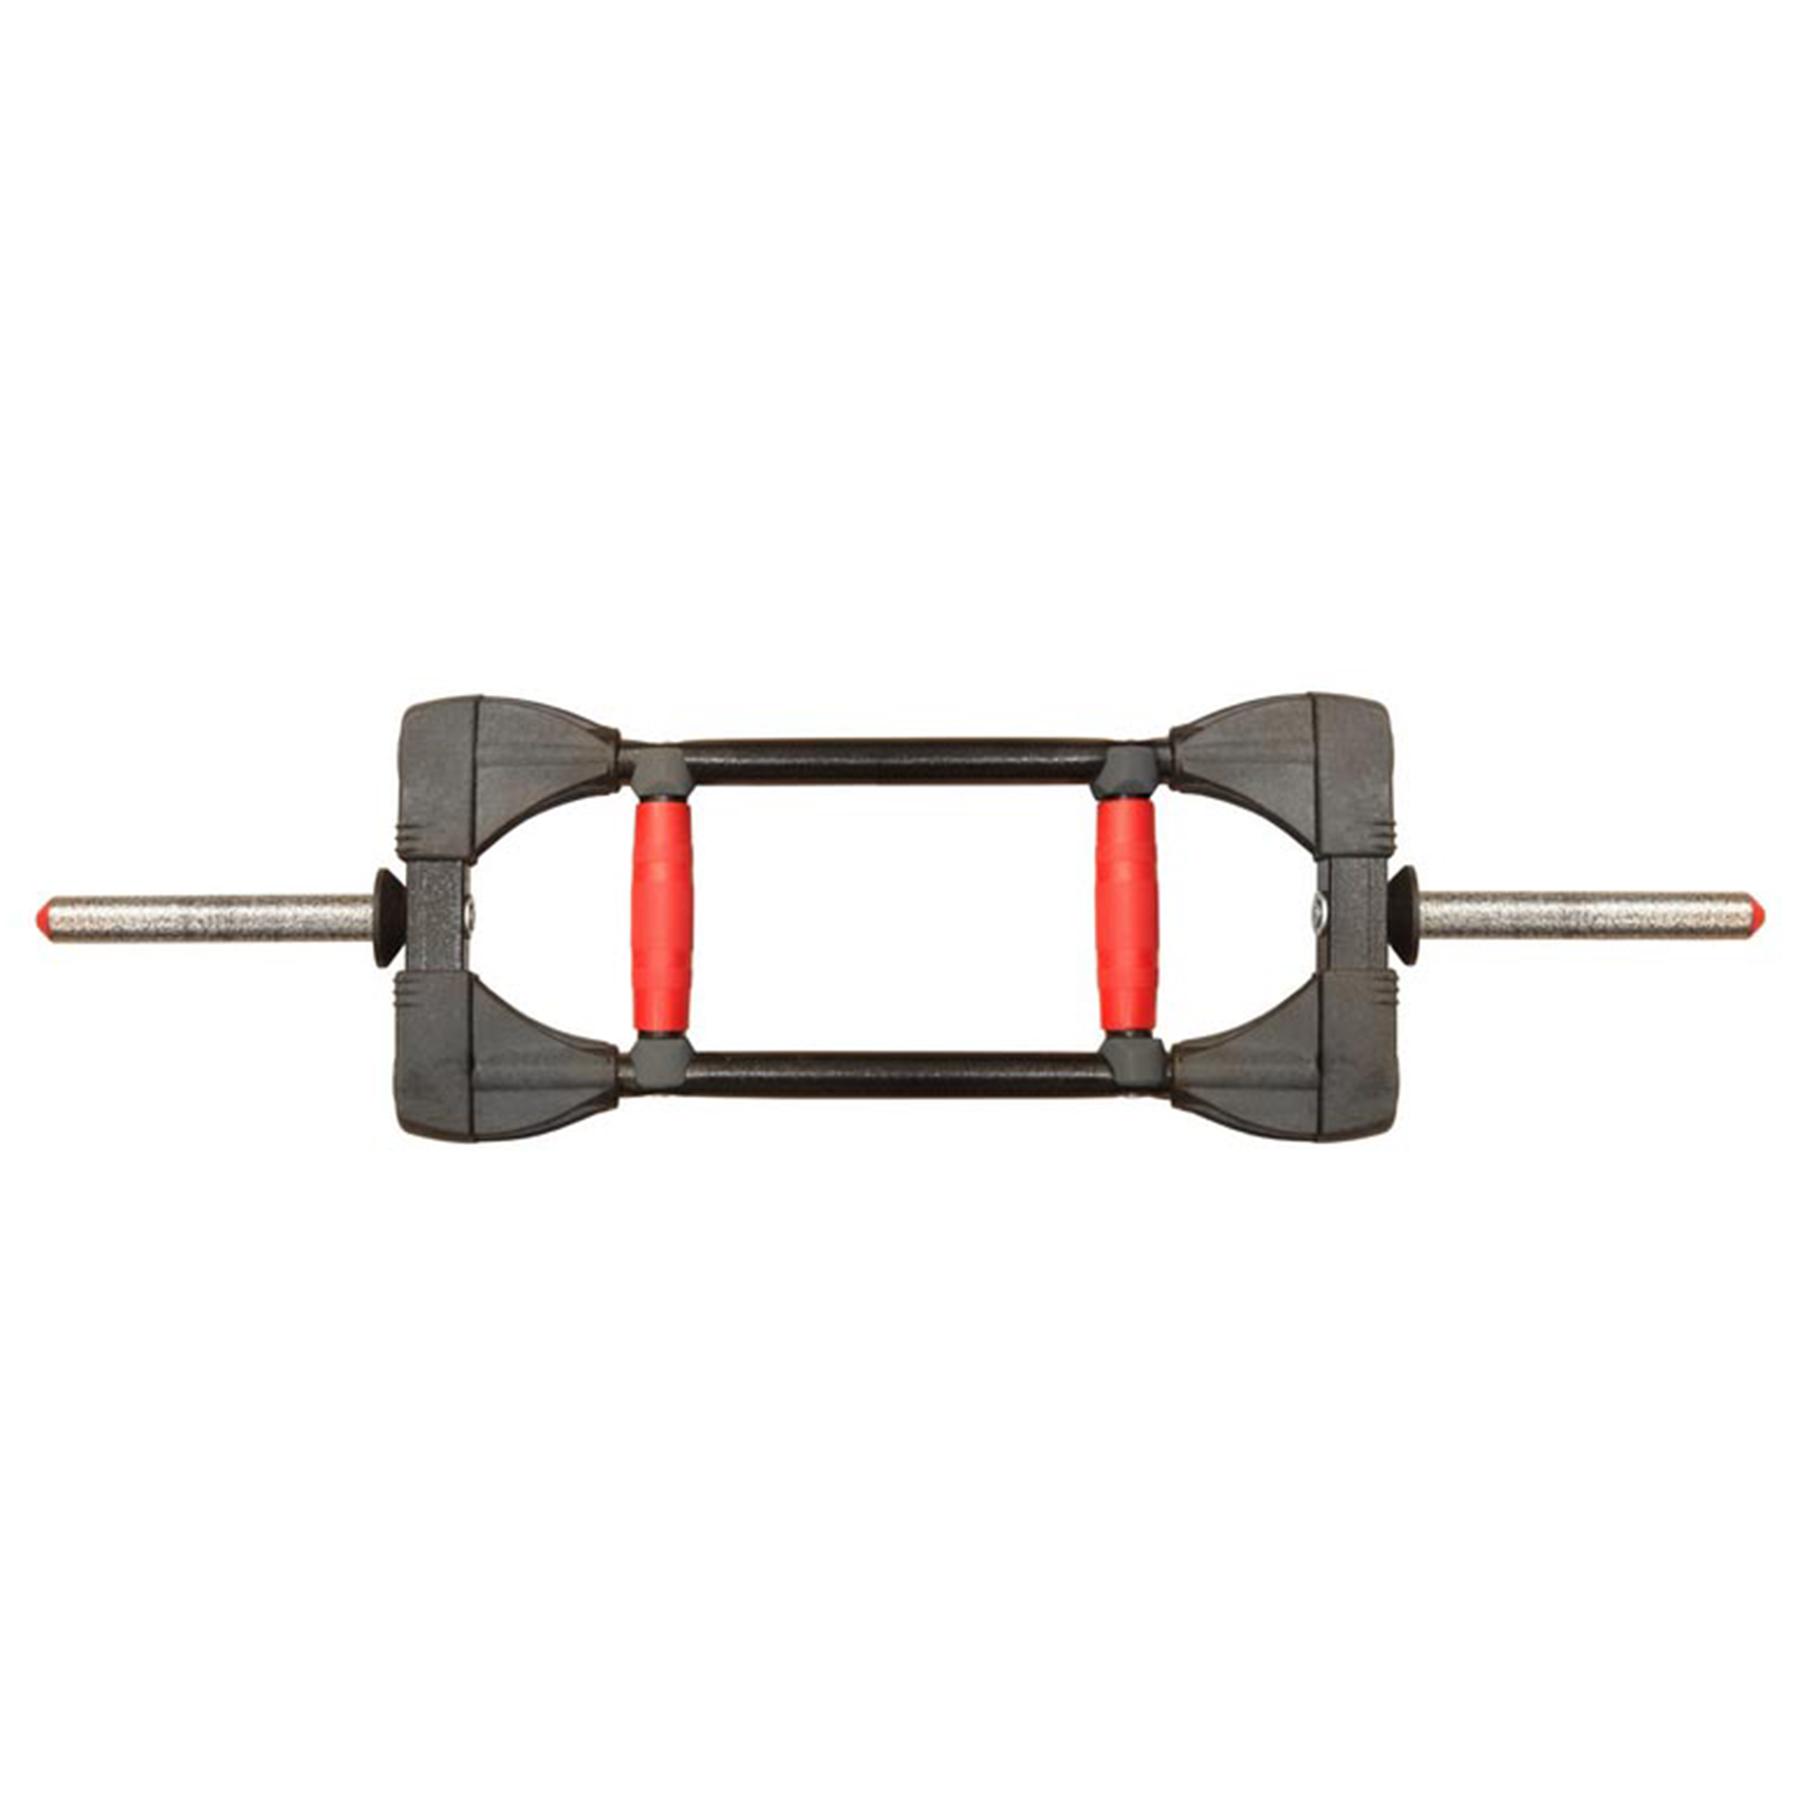 Гриф L-890 мм, d-26 мм Leco-IT Home параллельный, 2,5 кг (гп020144) УЦЕНКА!